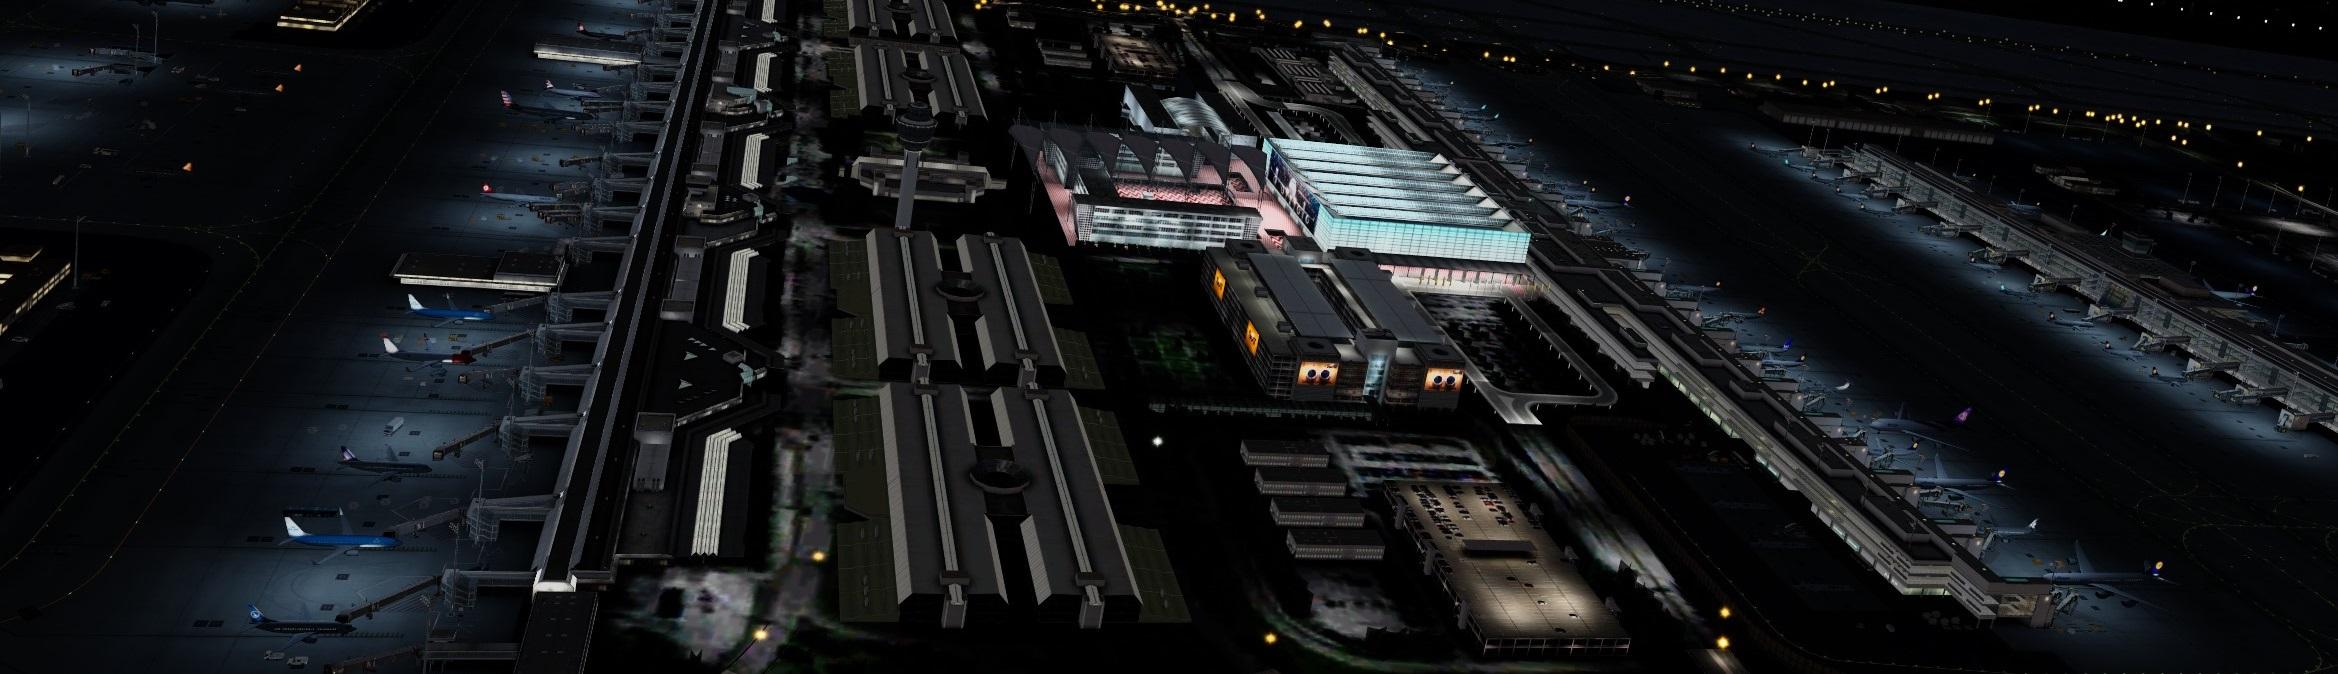 EDDM for P3Dv4 - SODE jetway enhancement - General Forum - Flight